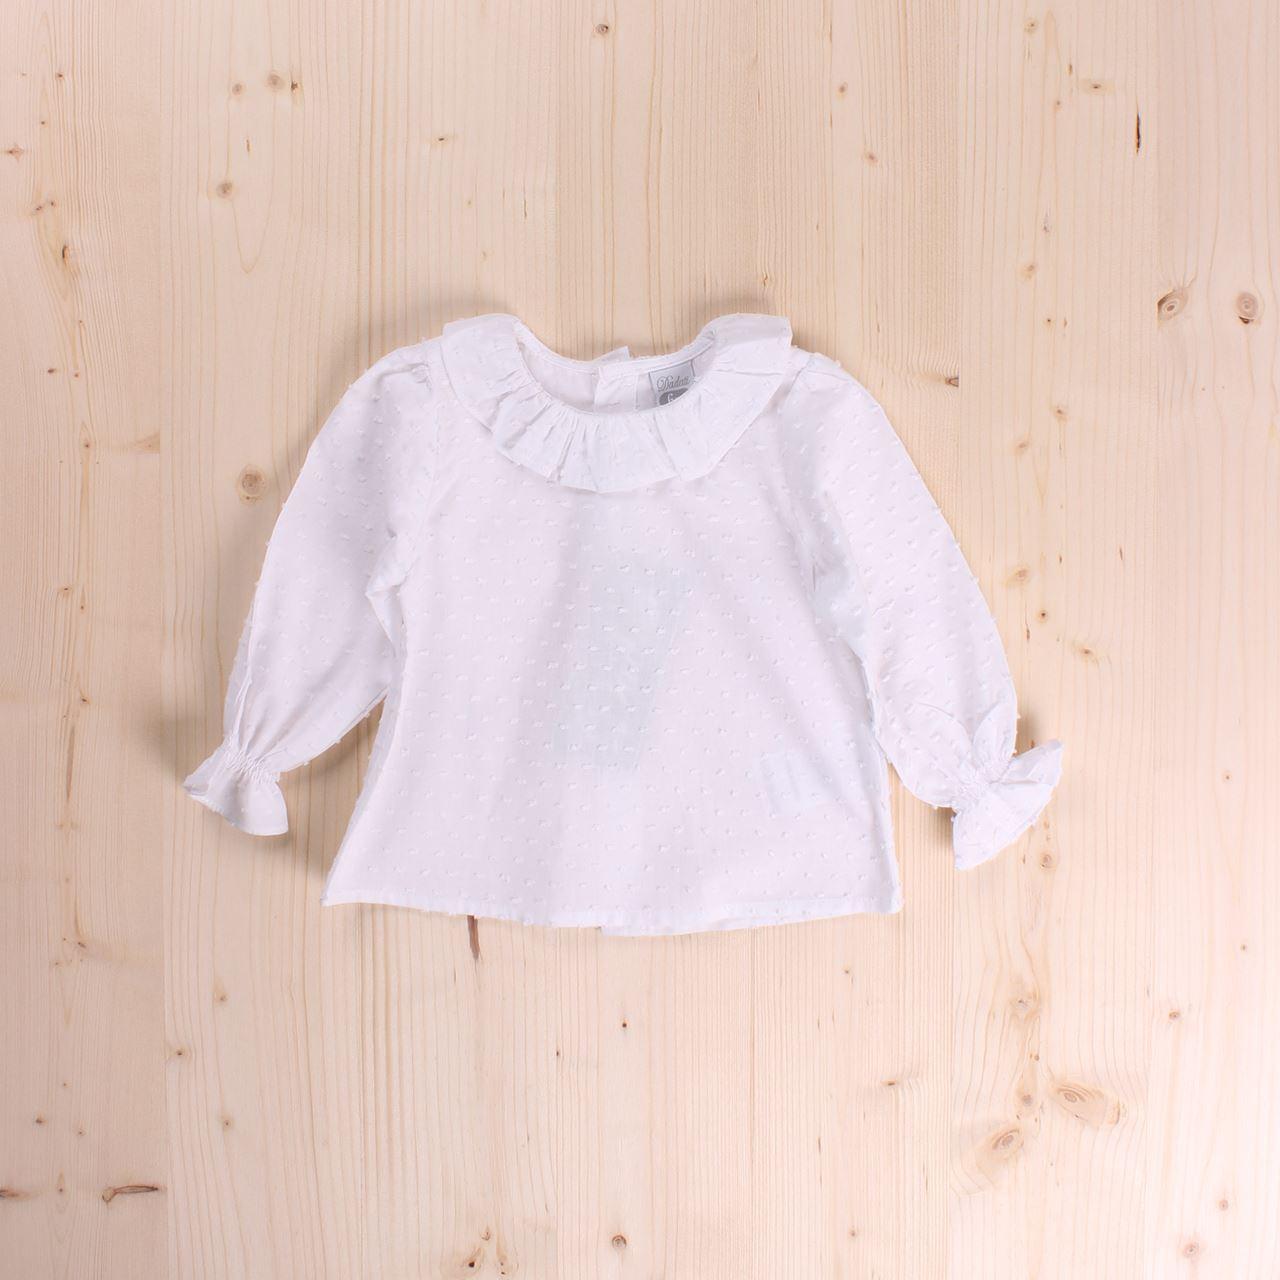 1e4641dd1 Camisa niña. Dadati - Moda infantil